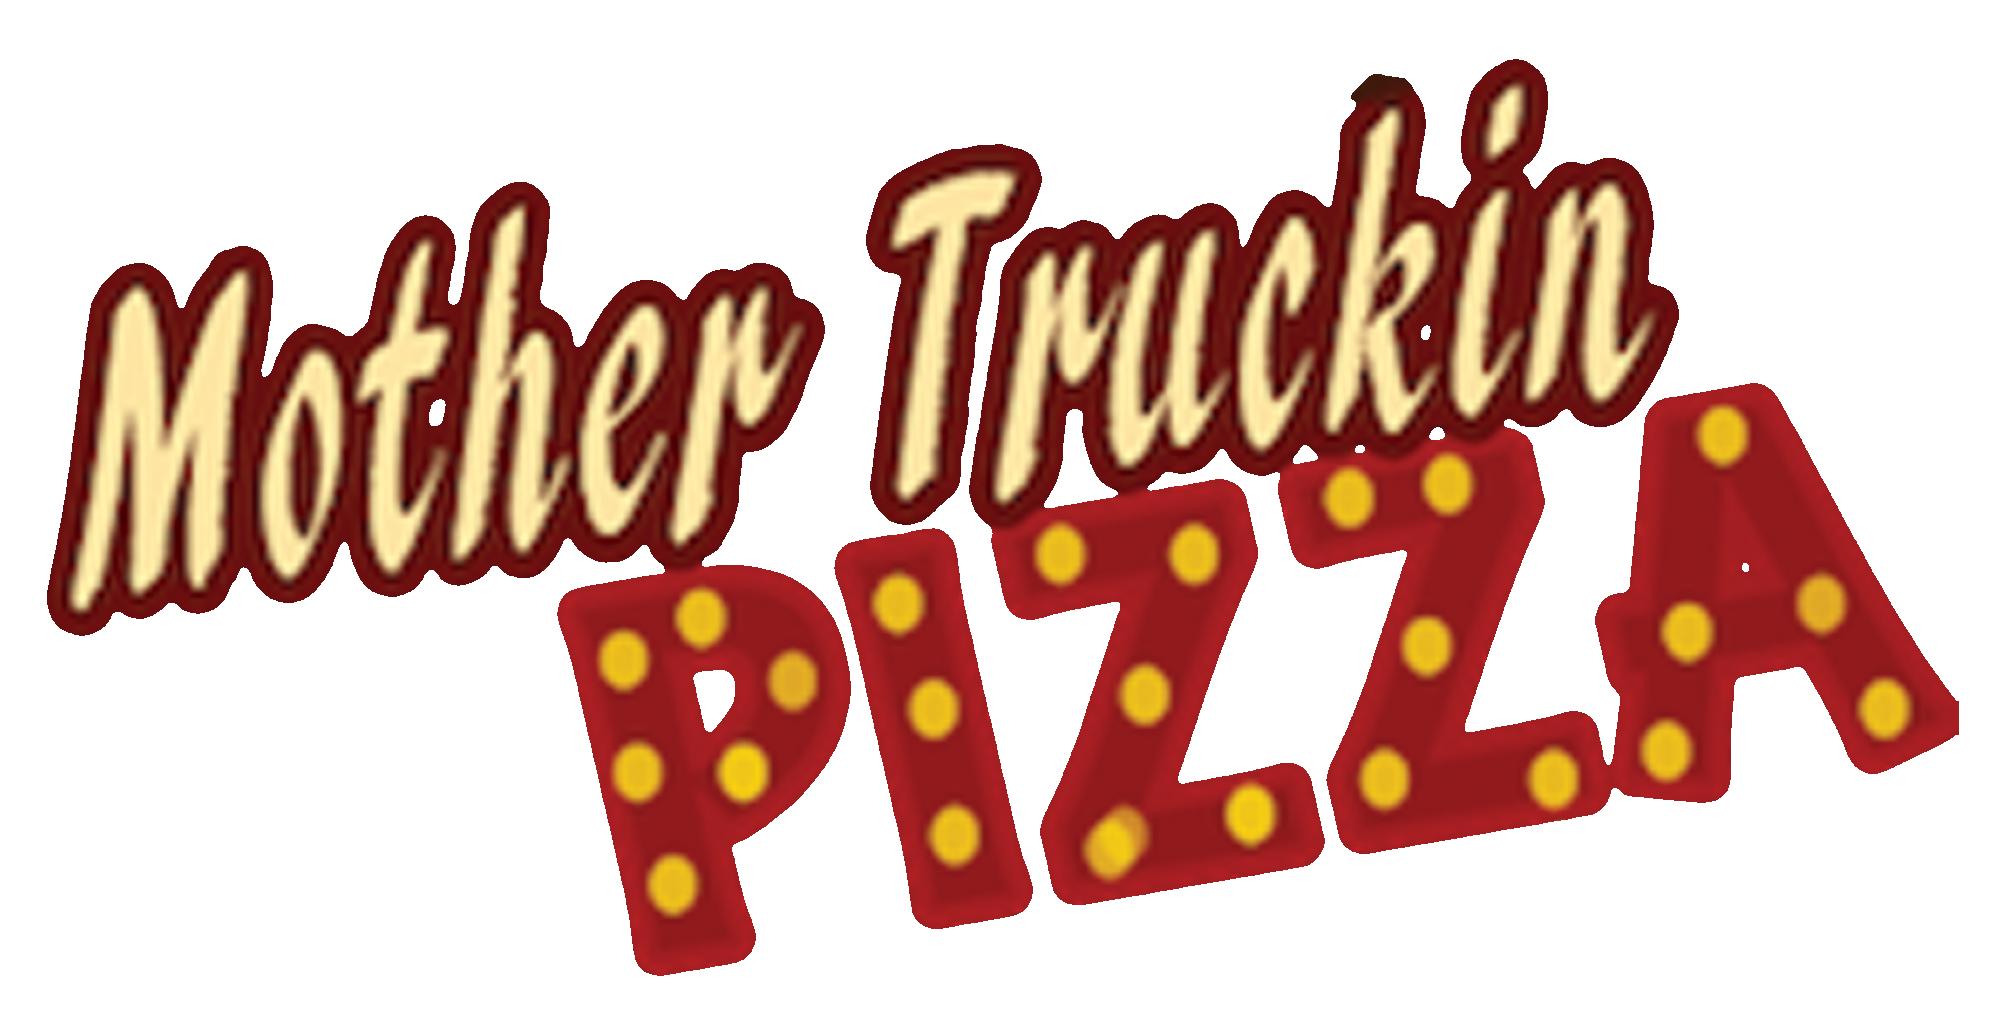 Mother Truckin' Pizza